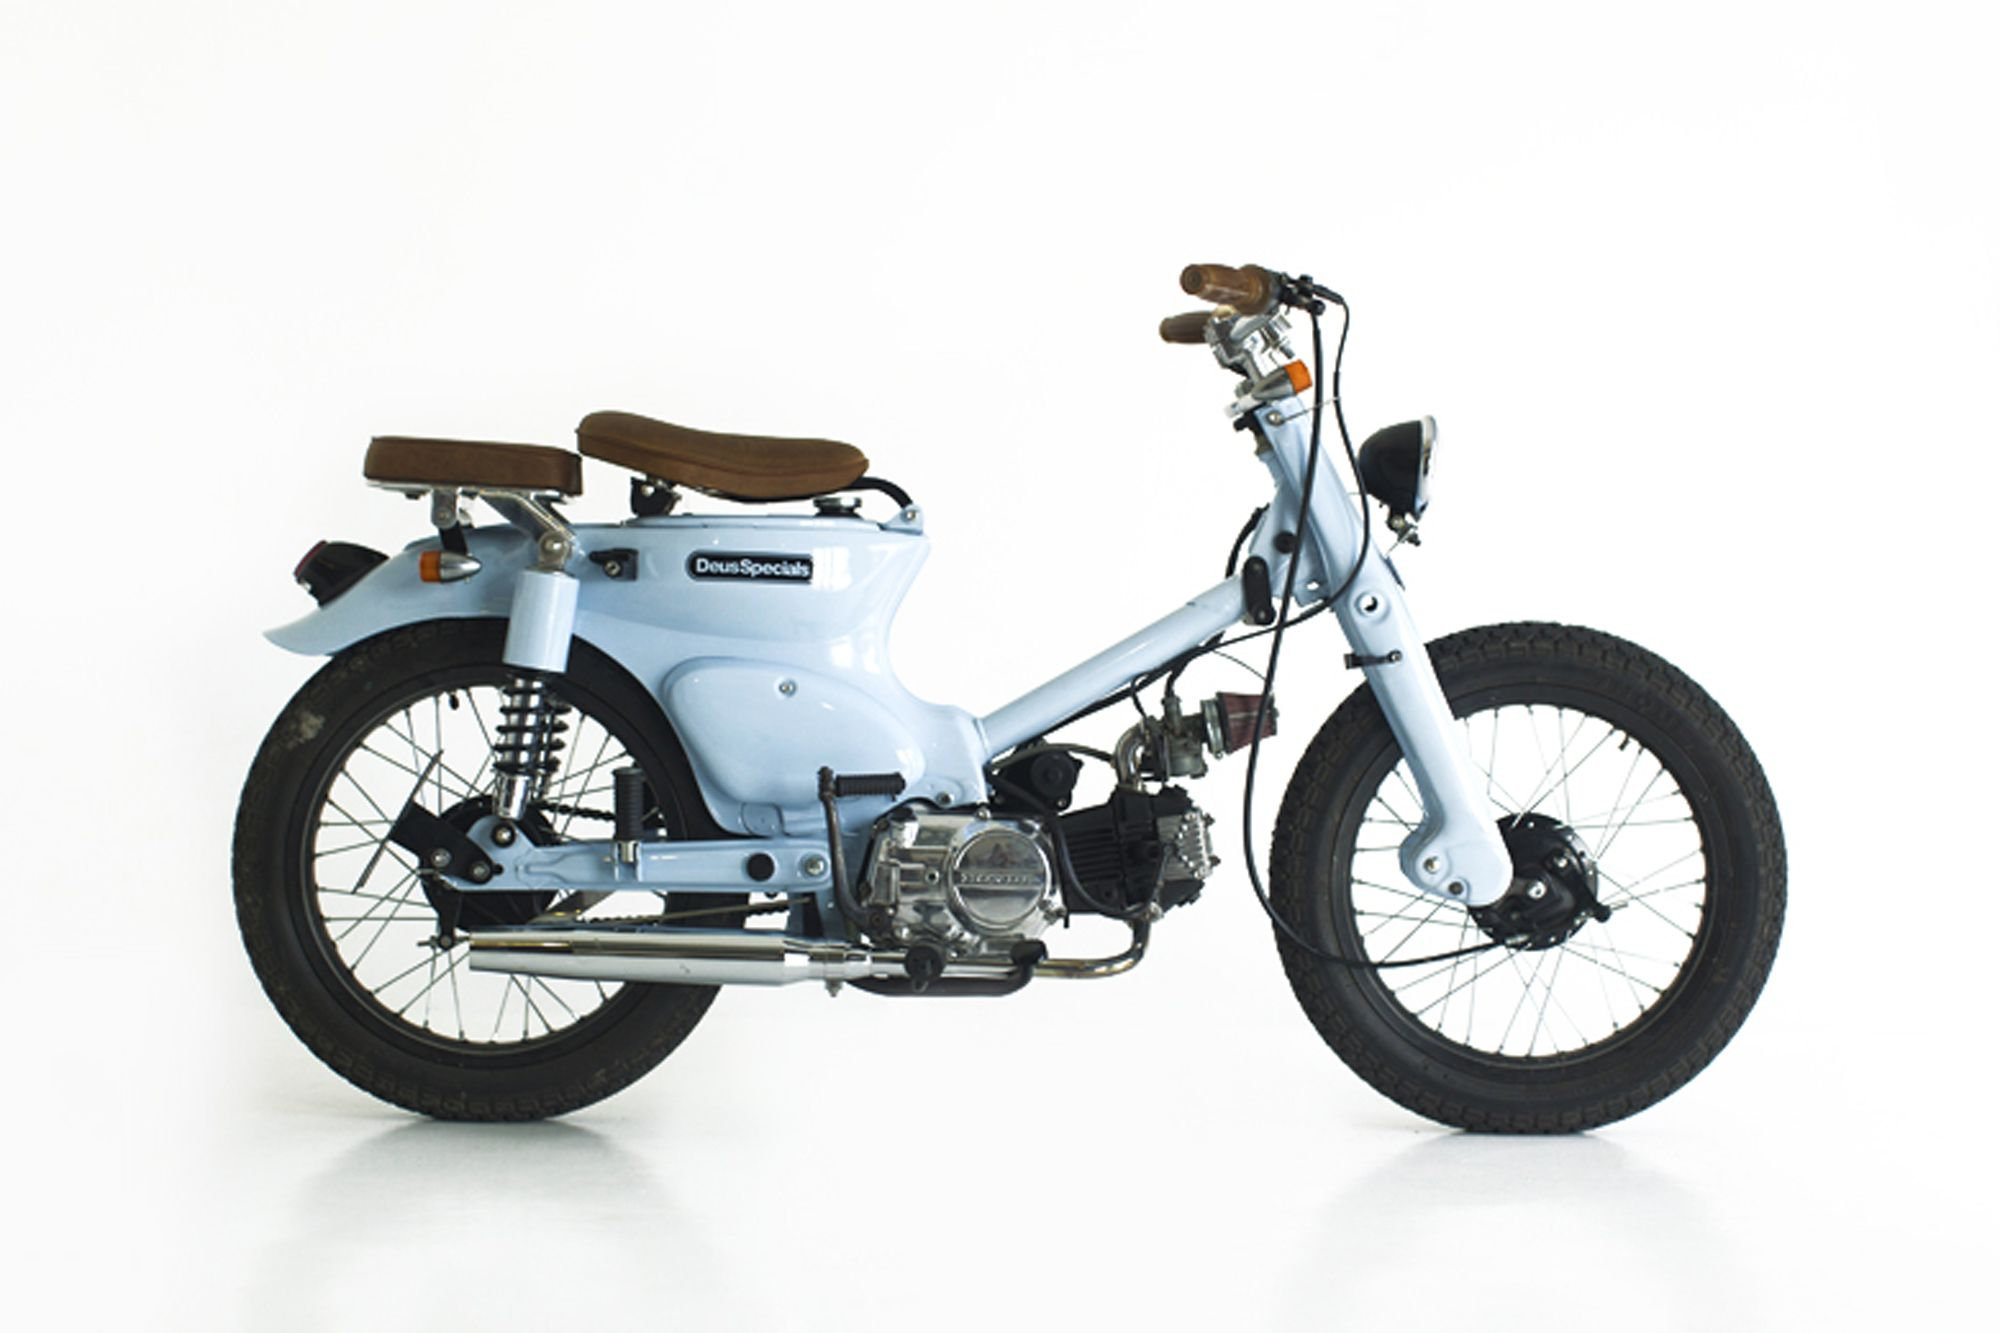 motorcycles for sale sydney yamaha xsr900 deus custom motorcycles moto 125 moto moto. Black Bedroom Furniture Sets. Home Design Ideas